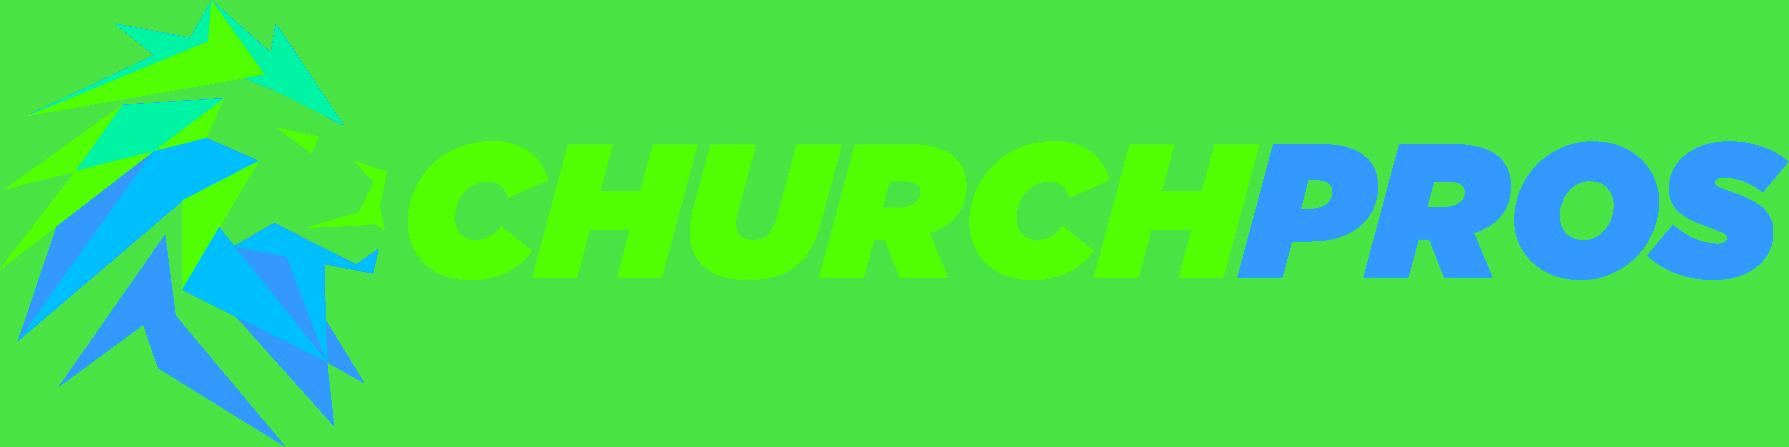 ChurchPros | Church Online Blueprint System